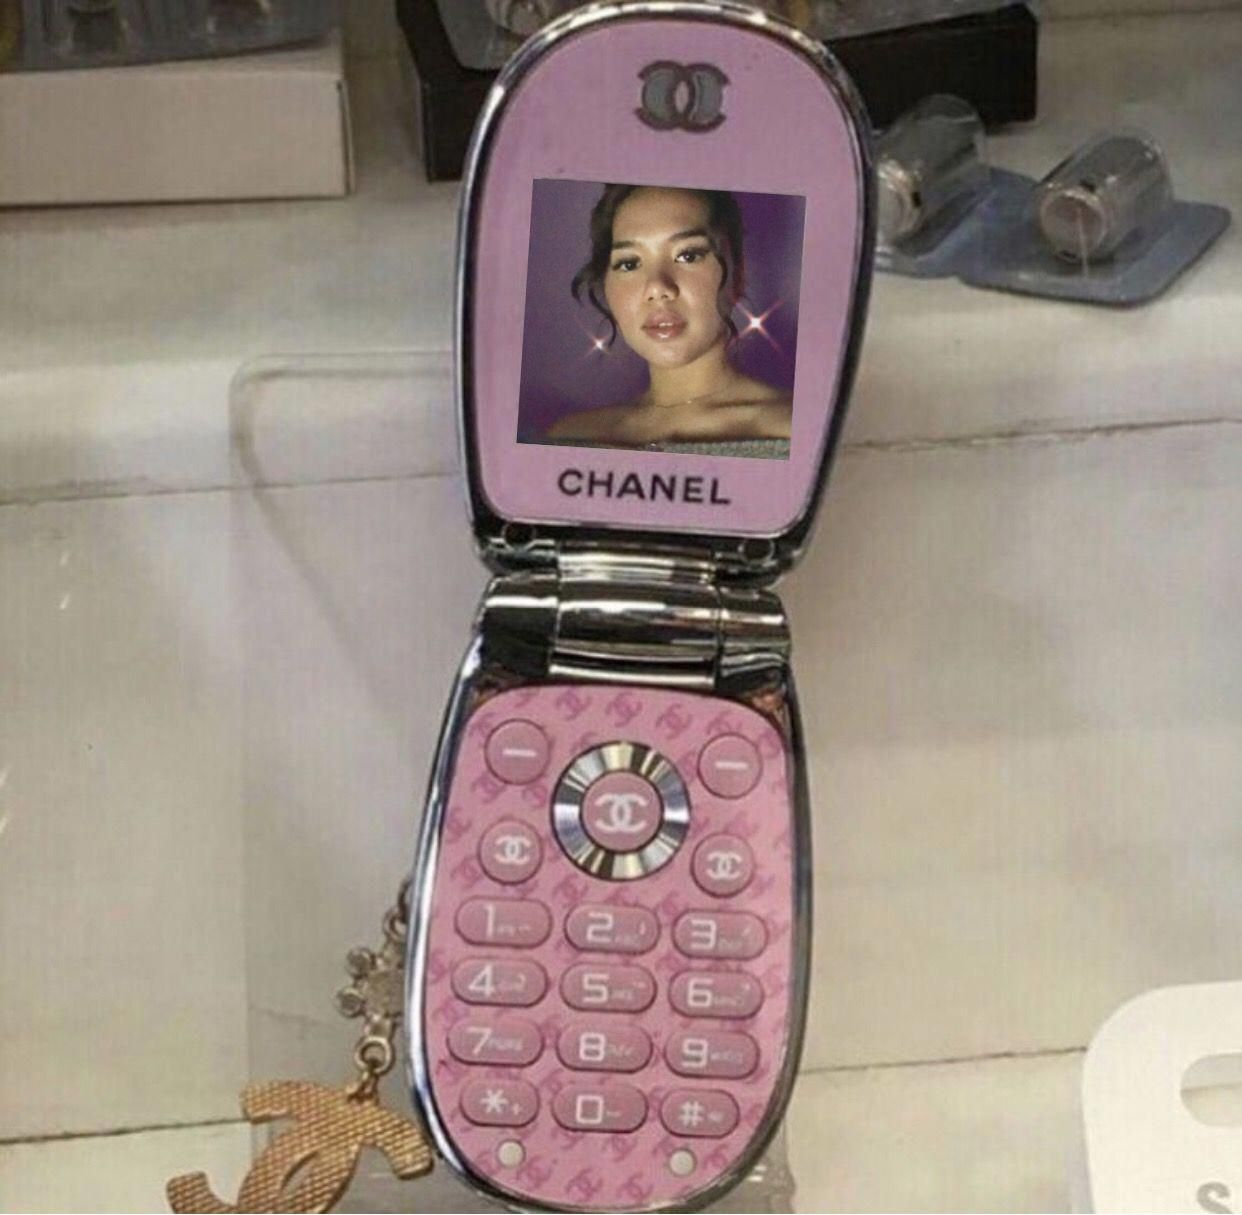 13 Sensational Flip Phone Verizon Samsung Cellphonewalletph Flipphone Retro Aesthetic Aesthetic Vintage Pink Aesthetic